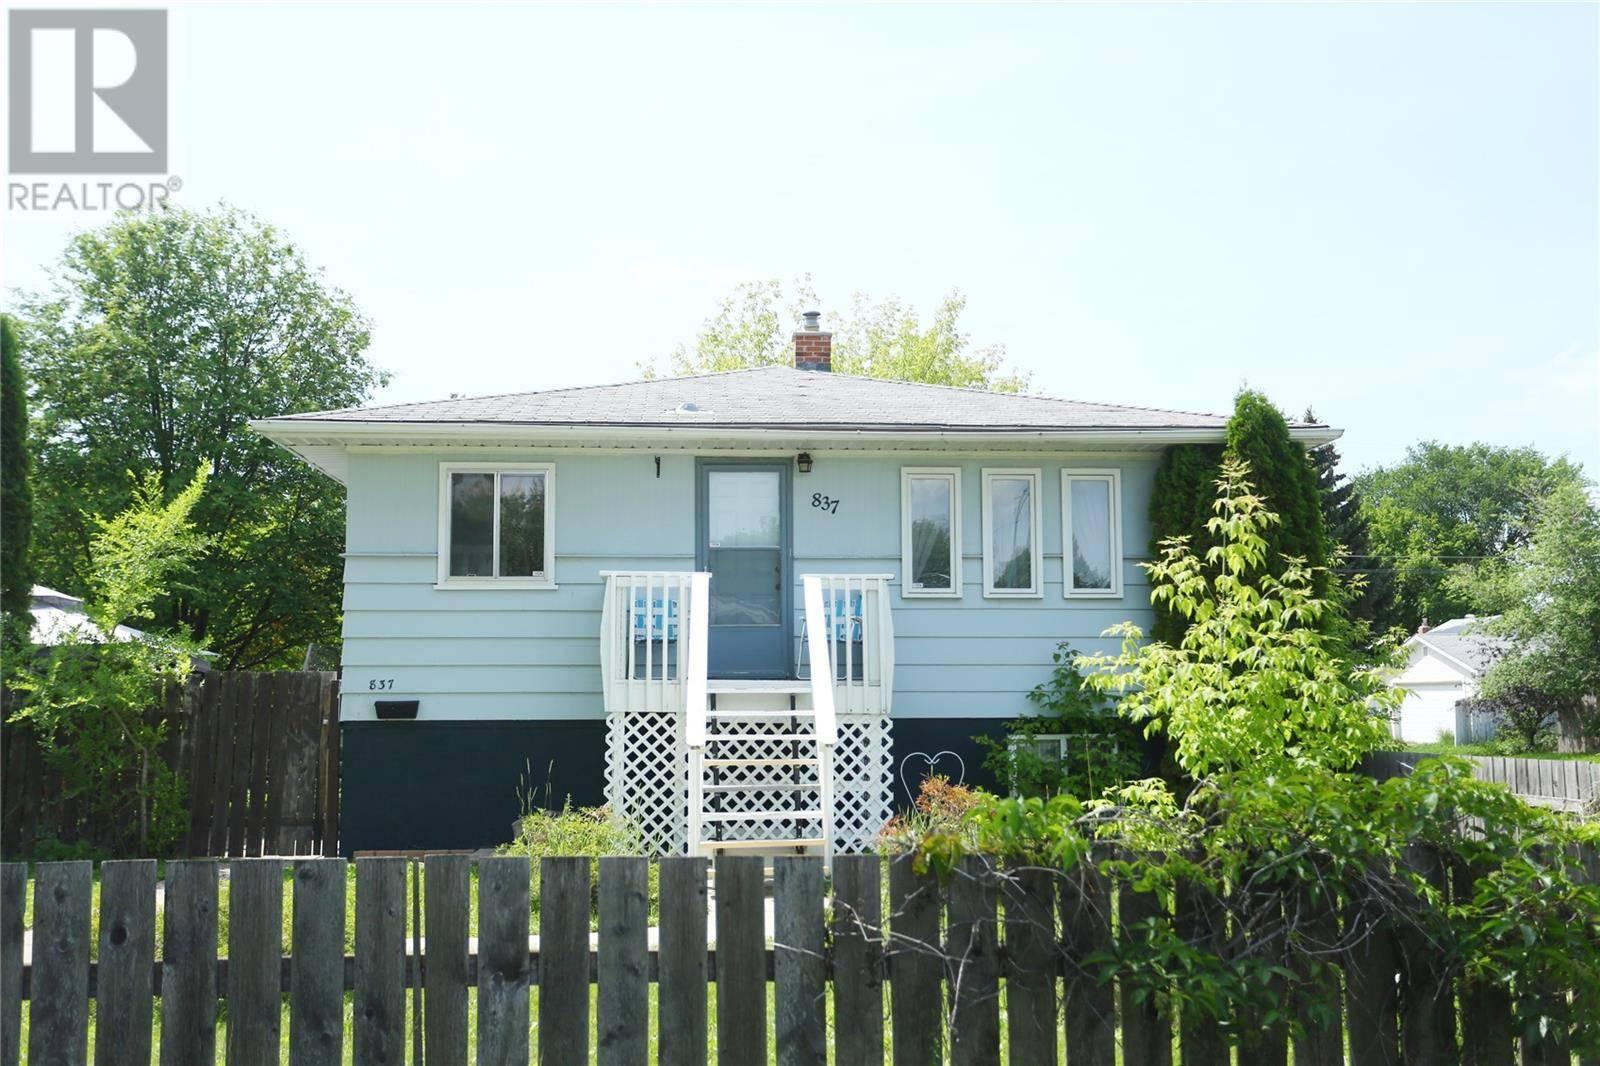 House for sale at 837 K Ave N Saskatoon Saskatchewan - MLS: SK789769